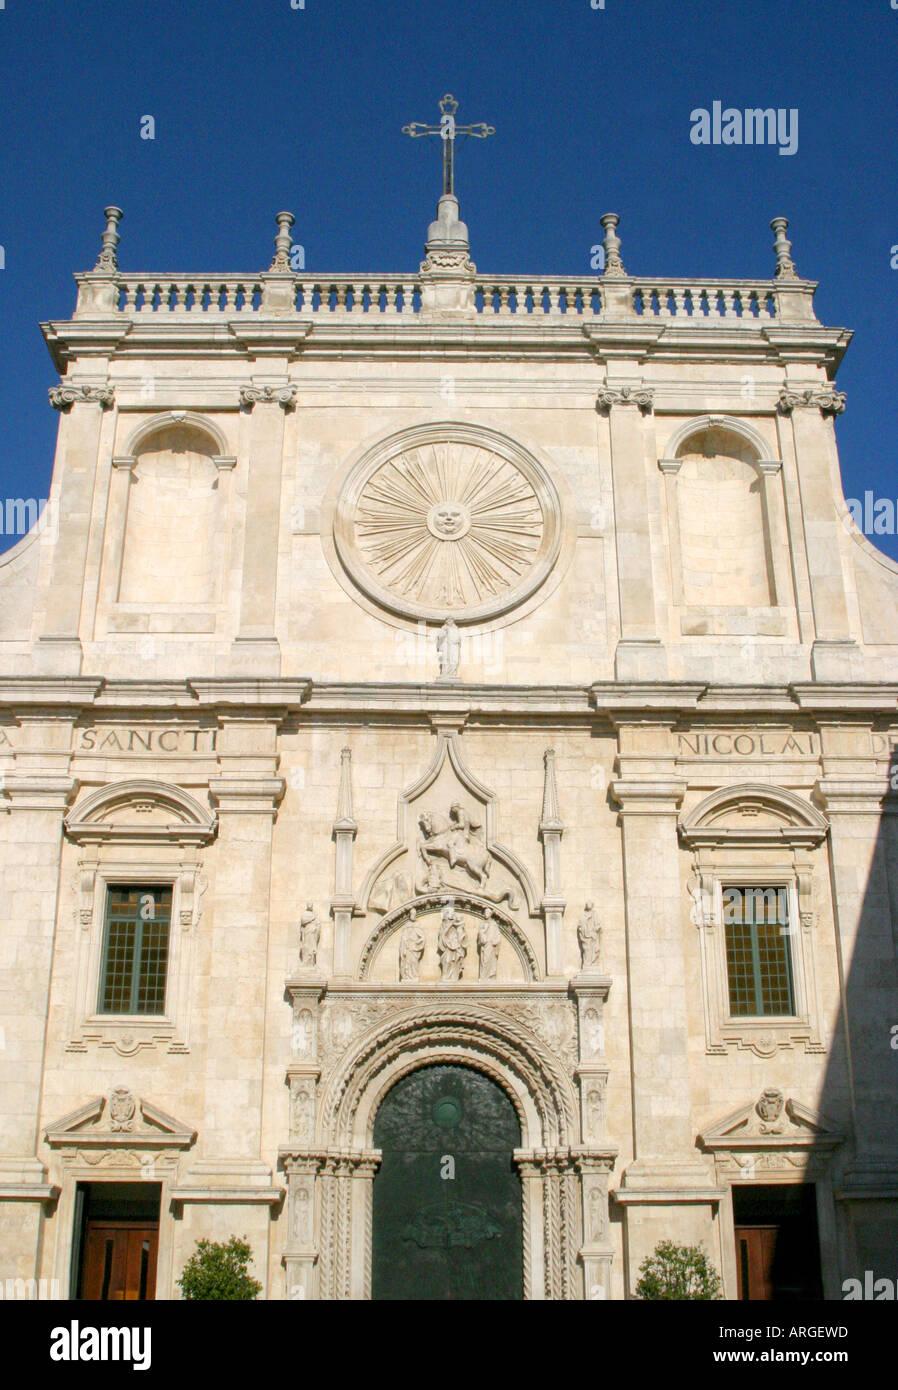 Facade of the Church of San Nicolo of Tolentino in the Marches, le Marche , Italy - Stock Image